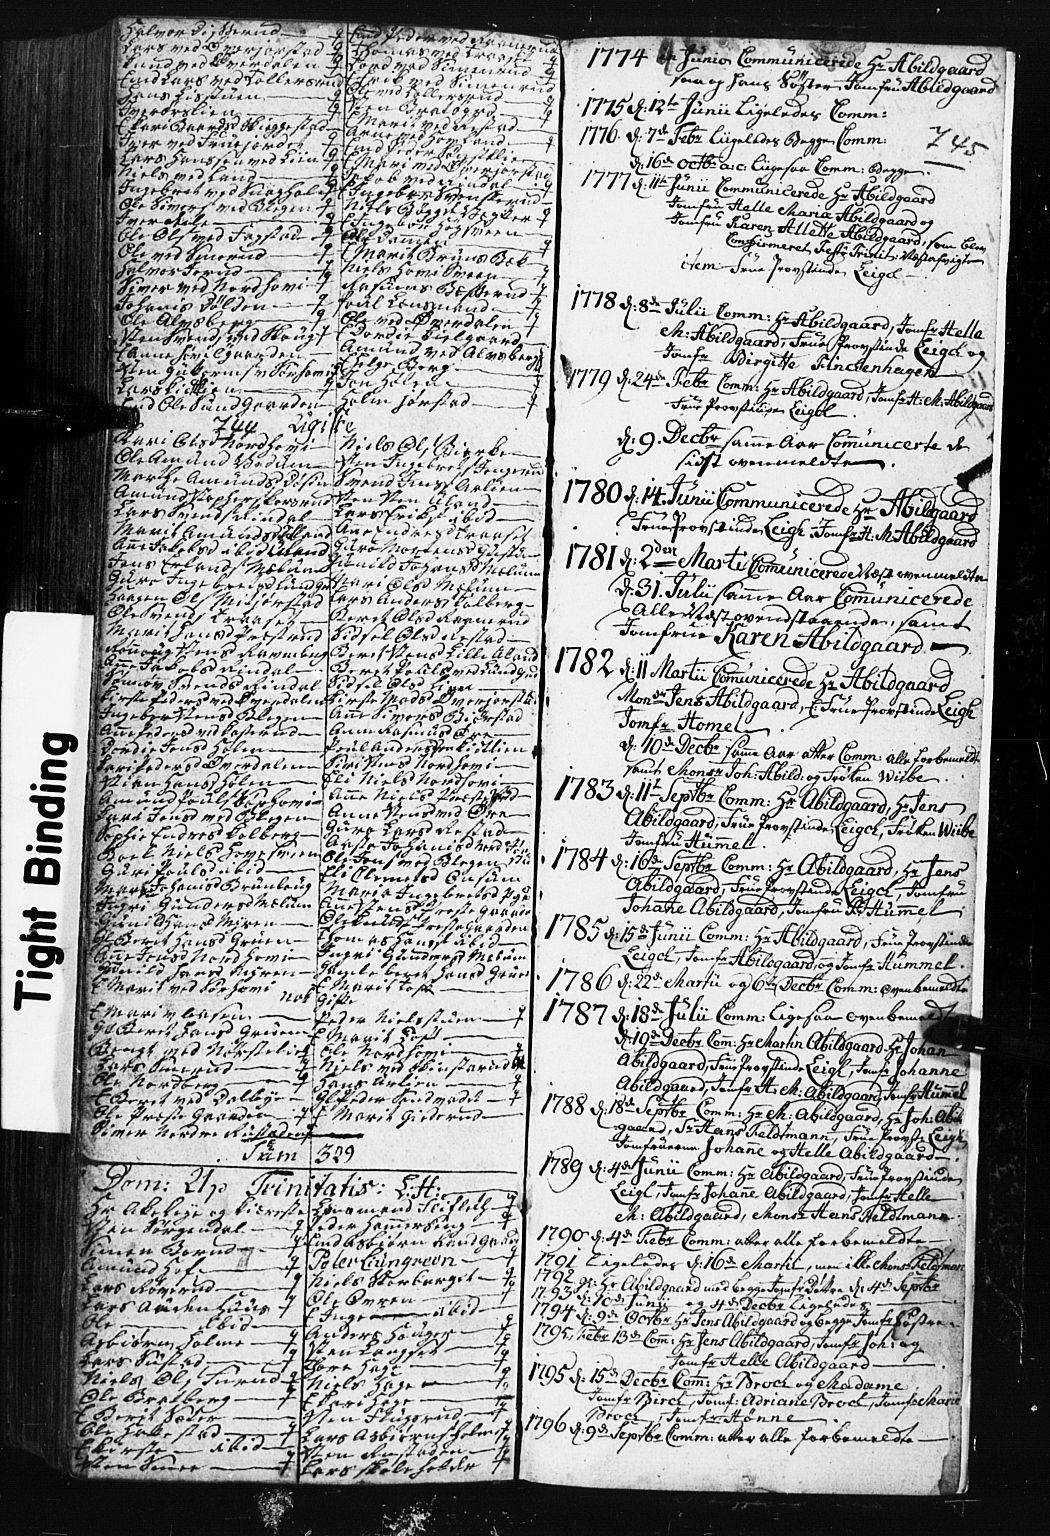 SAH, Fåberg prestekontor, Klokkerbok nr. 3, 1768-1796, s. 744-745